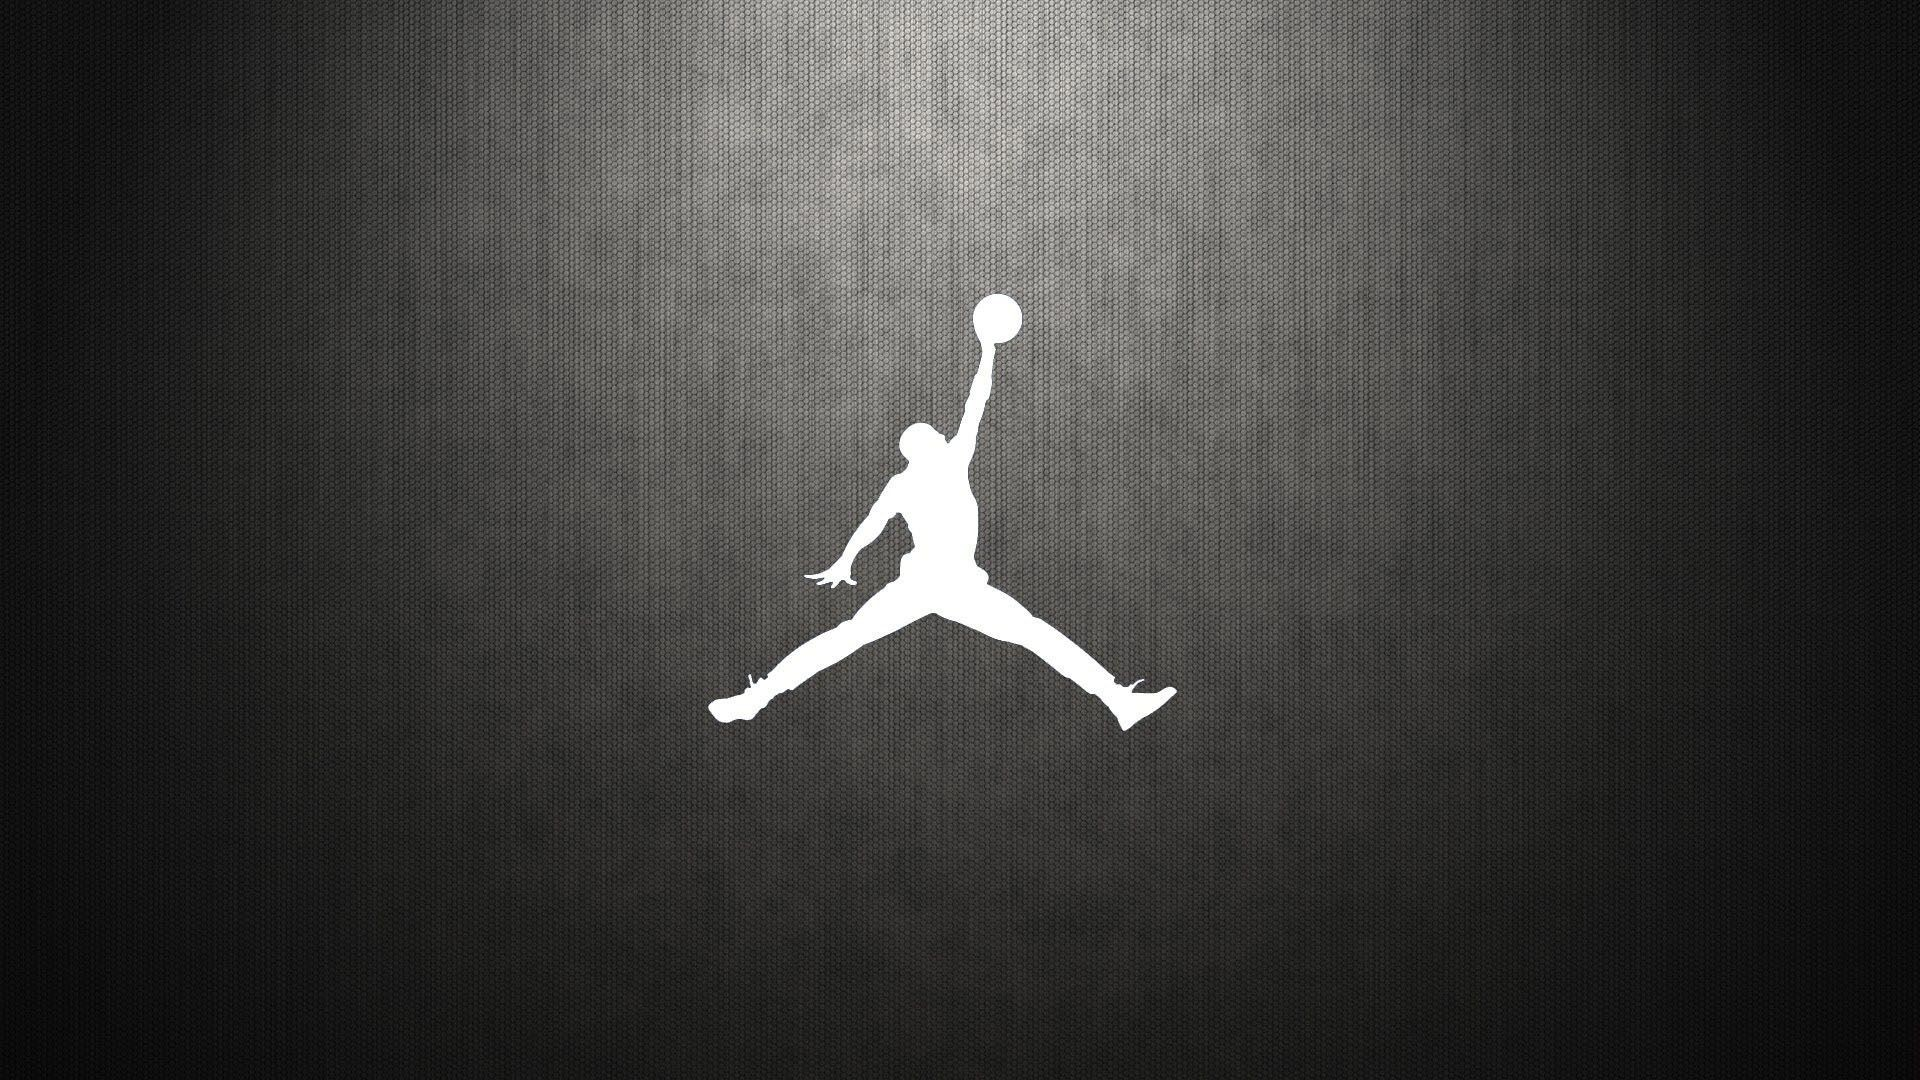 Res: 1920x1080, Nike Wallpapers HD Wallpaper 1920×1080 Nike Wallpaper Hd (44 Wallpapers) |  Adorable